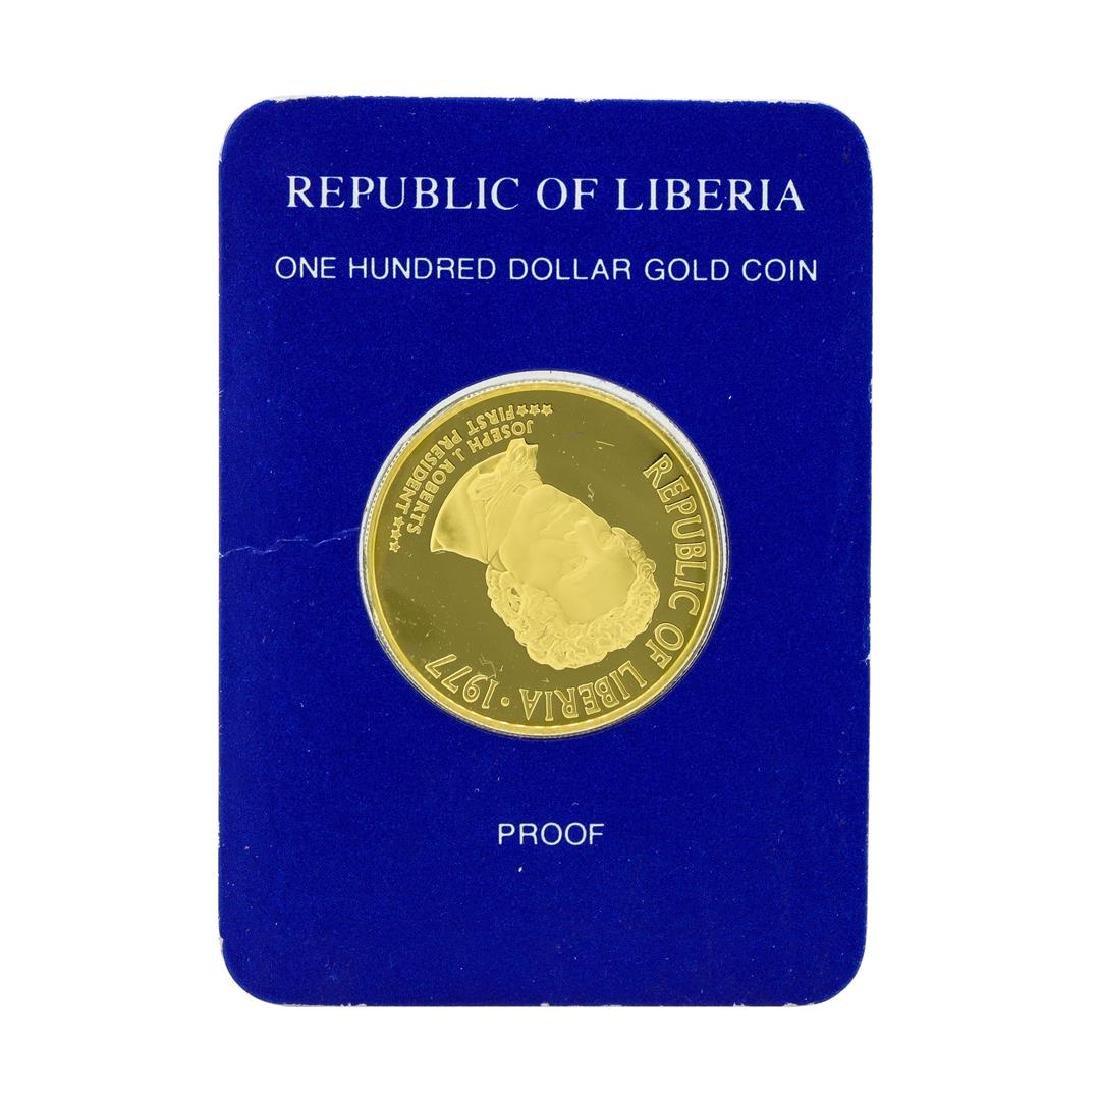 1977 Republic of Liberia $100 Gold Proof Coin